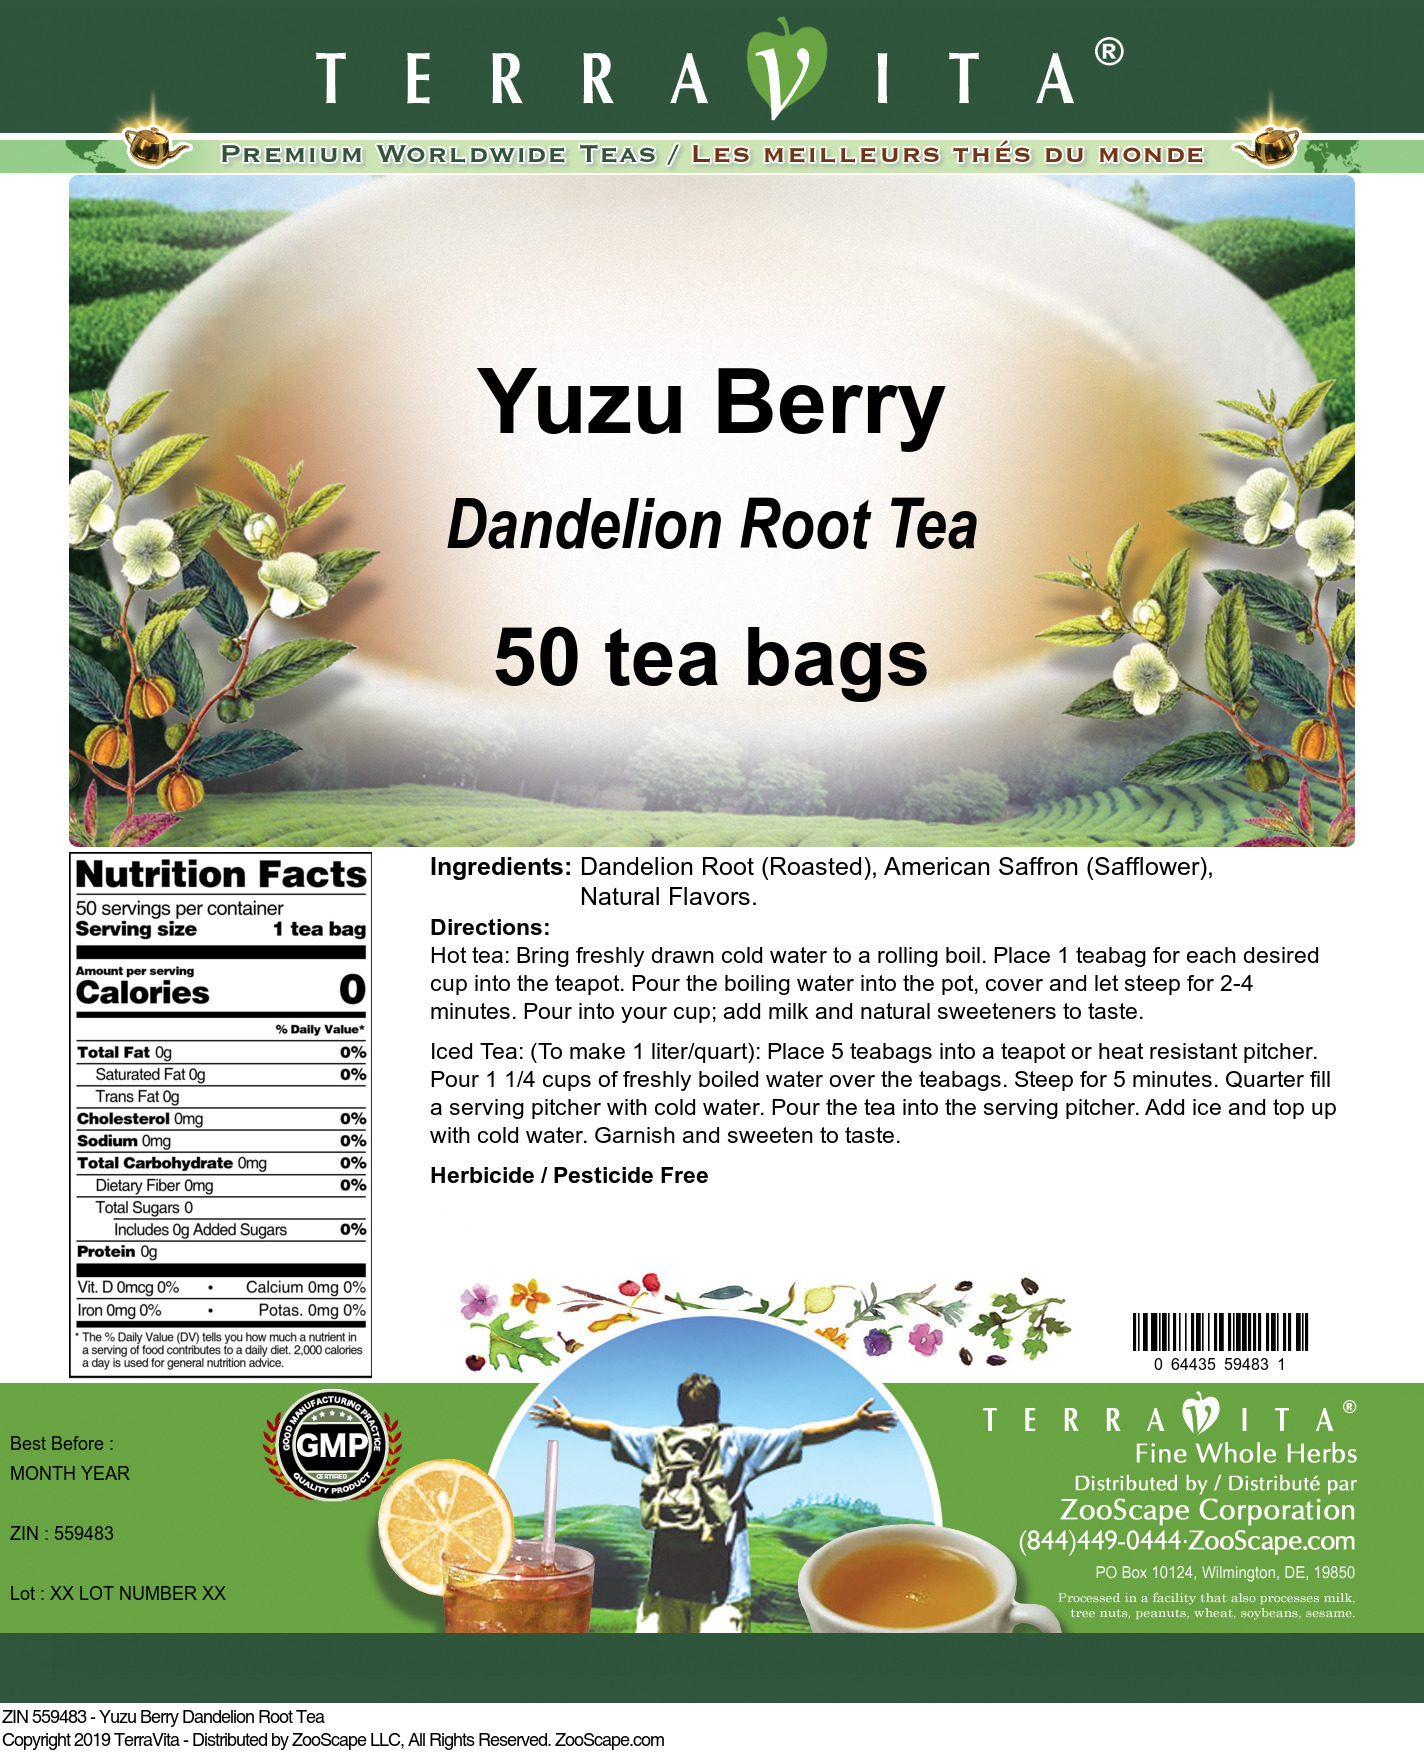 Yuzu Berry Dandelion Root Tea